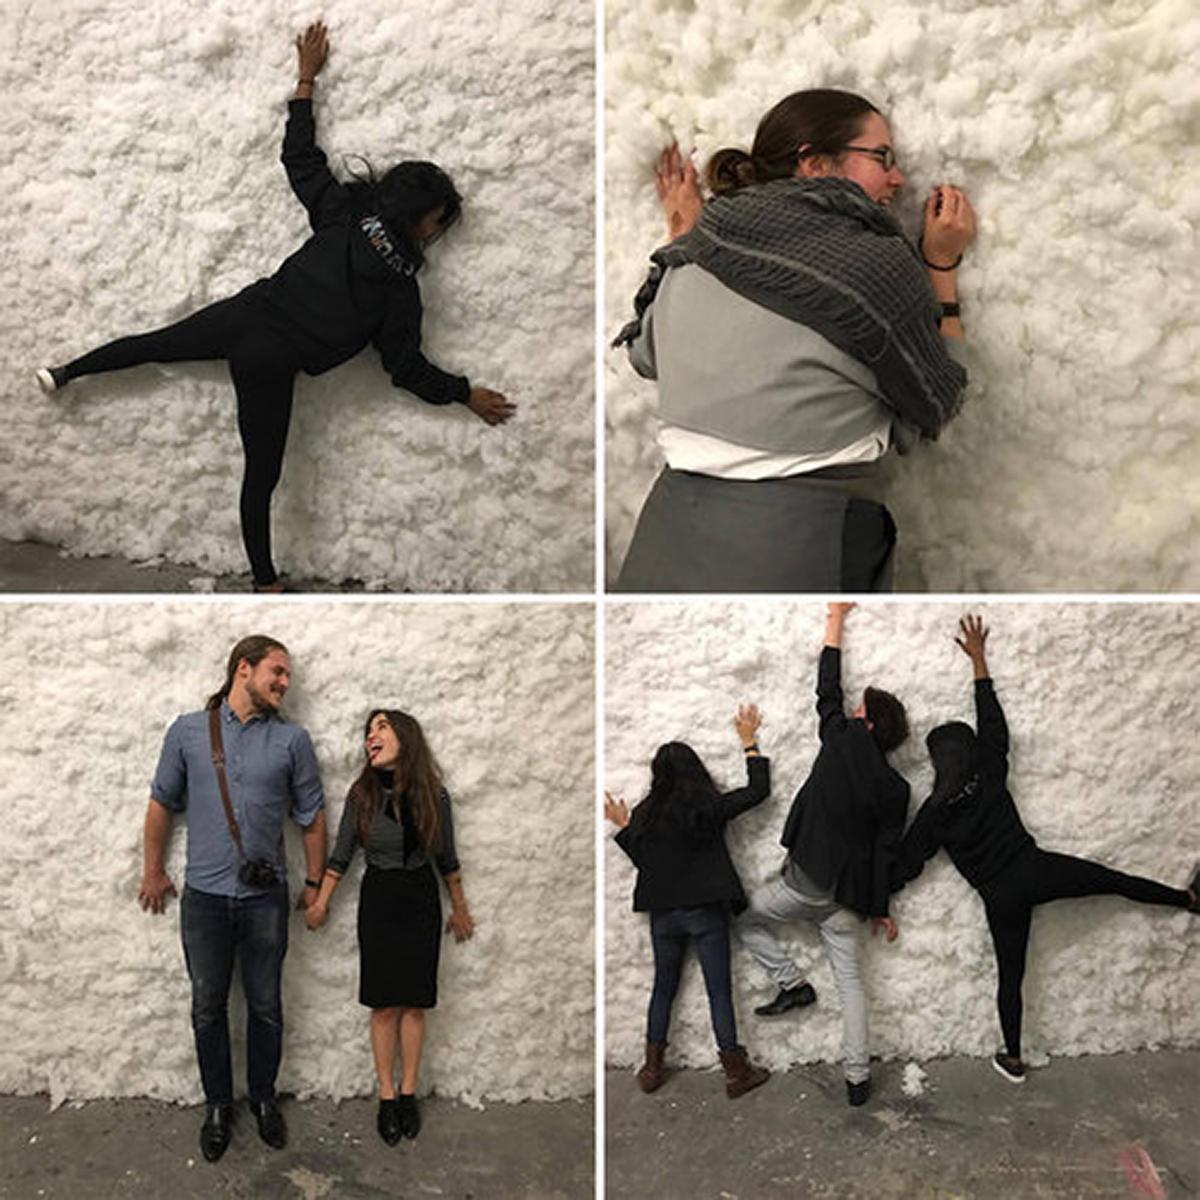 Pillow filler, drywall, mud, 168 x 120 x 8 in., 2017